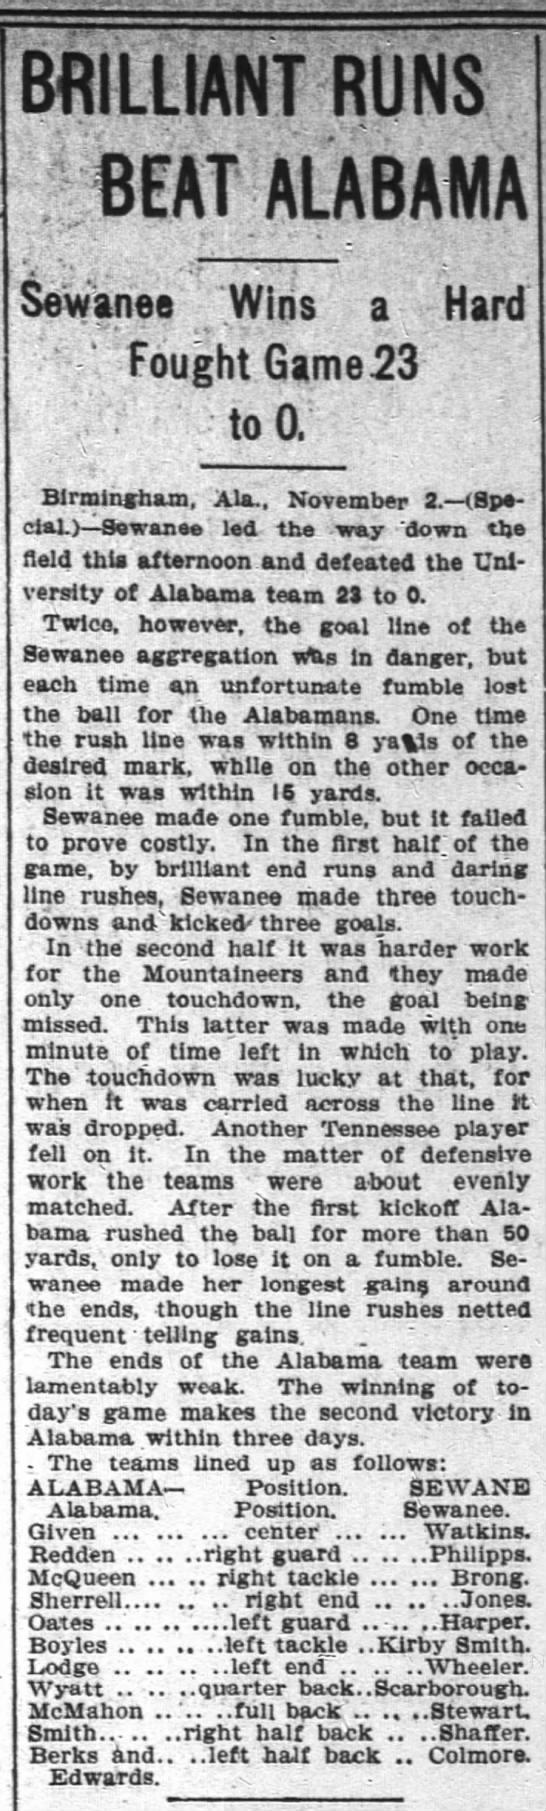 """Brilliant runs beat Alabama,"" The Atlanta Constitution, November 3, 1903, p.9 -"